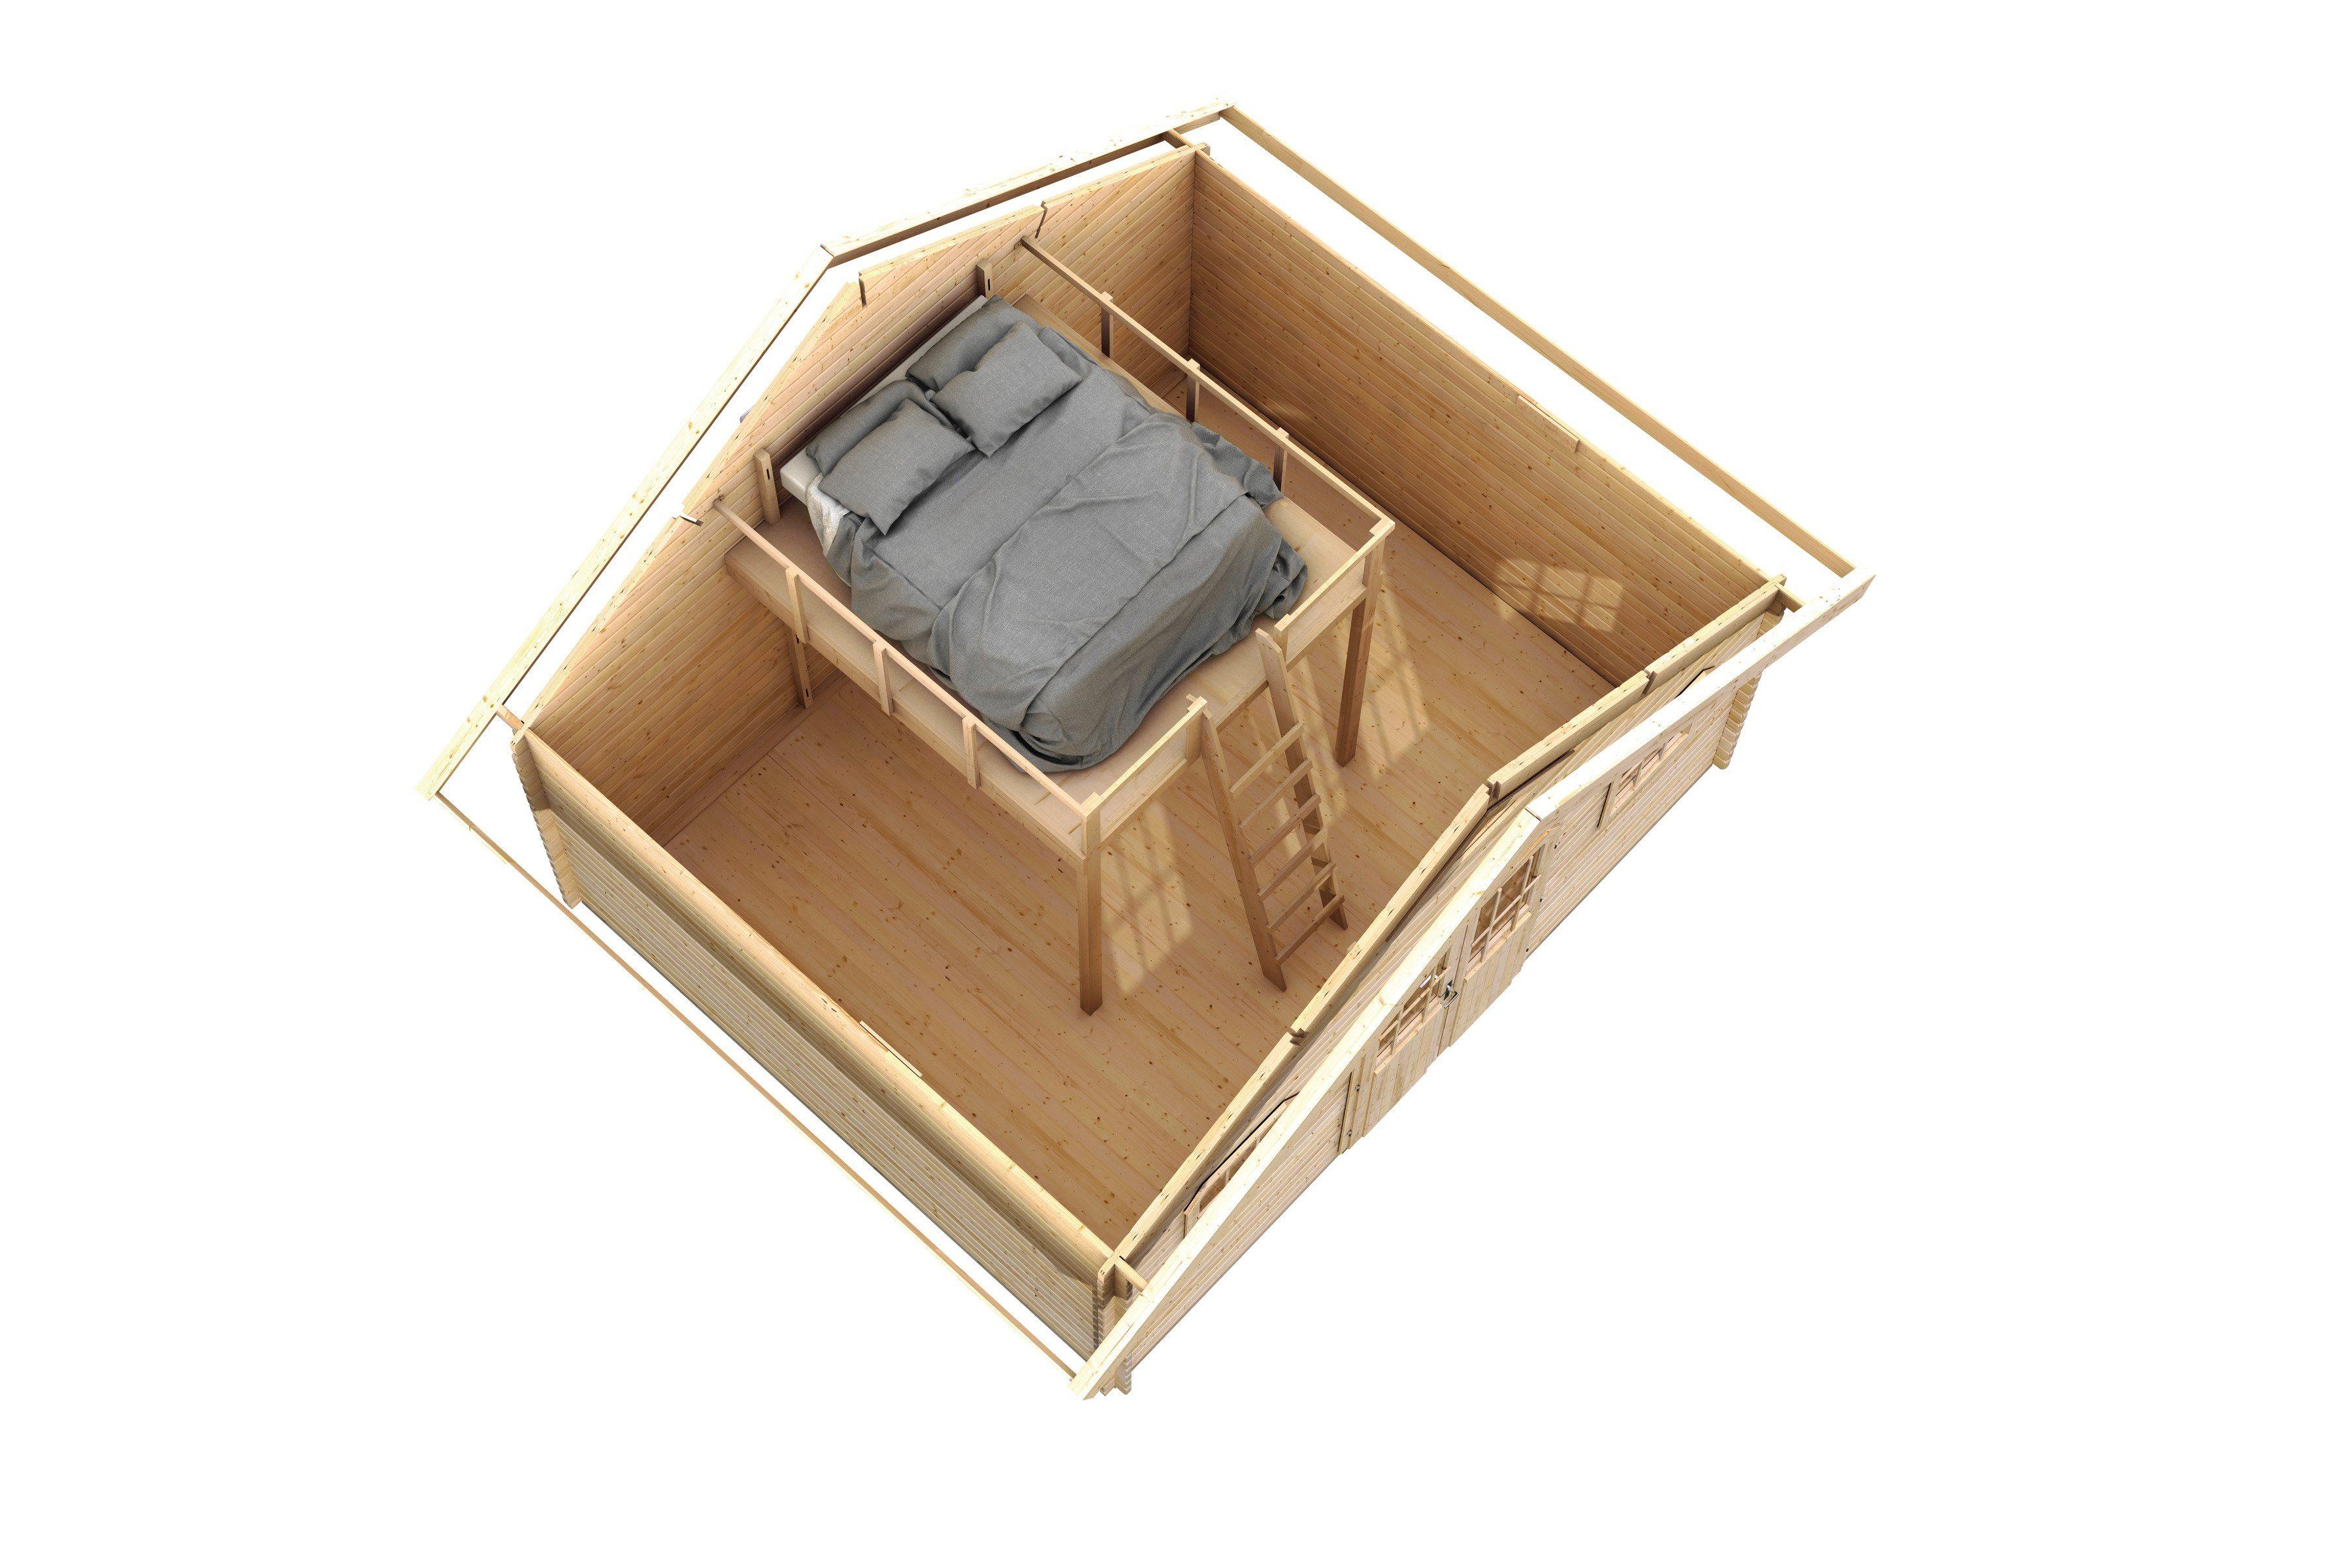 KARIBU Schlafboden , BxTxH: 210x242x200 cm, für Karibu-Produkte